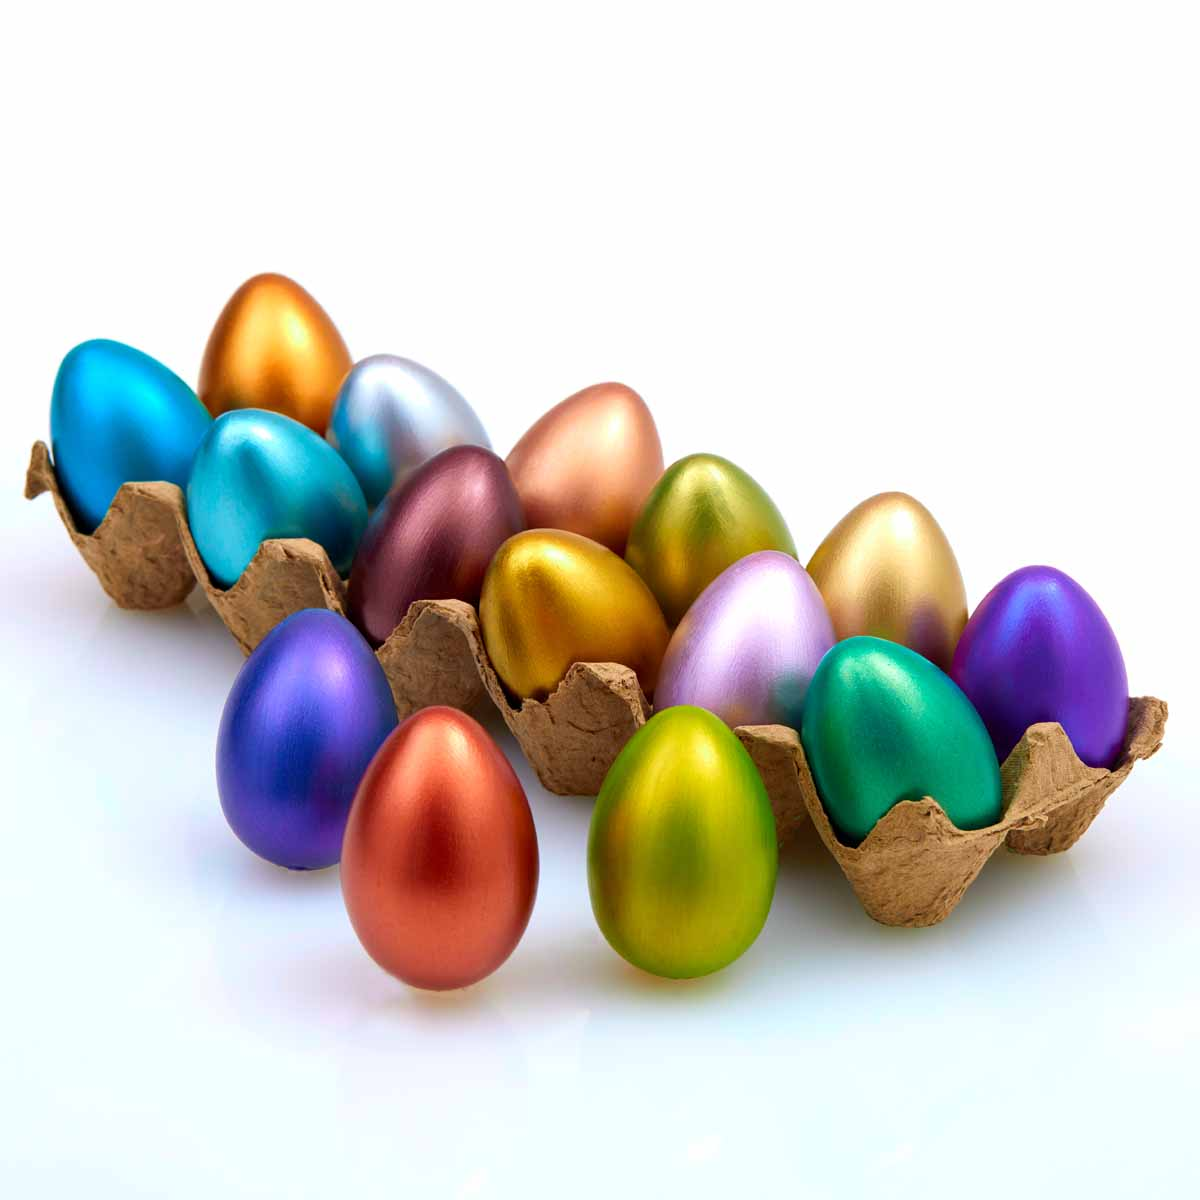 Jewel-Tone Easter Eggs